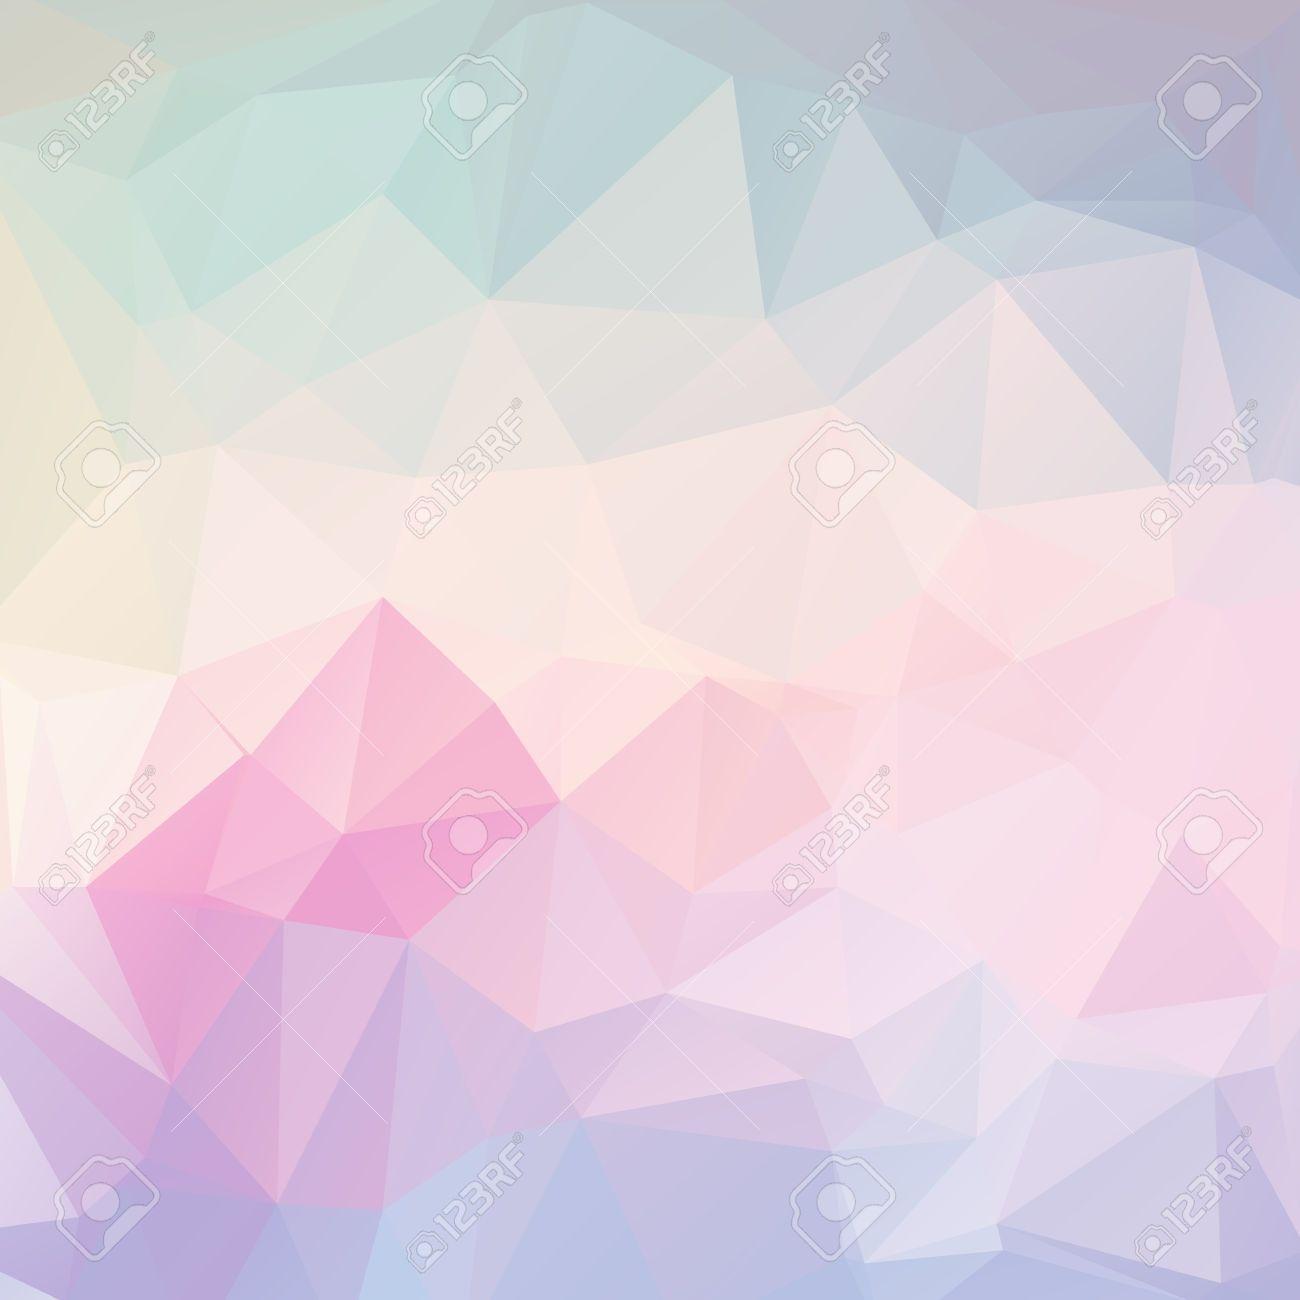 pastel backgrounds wallpaper cave